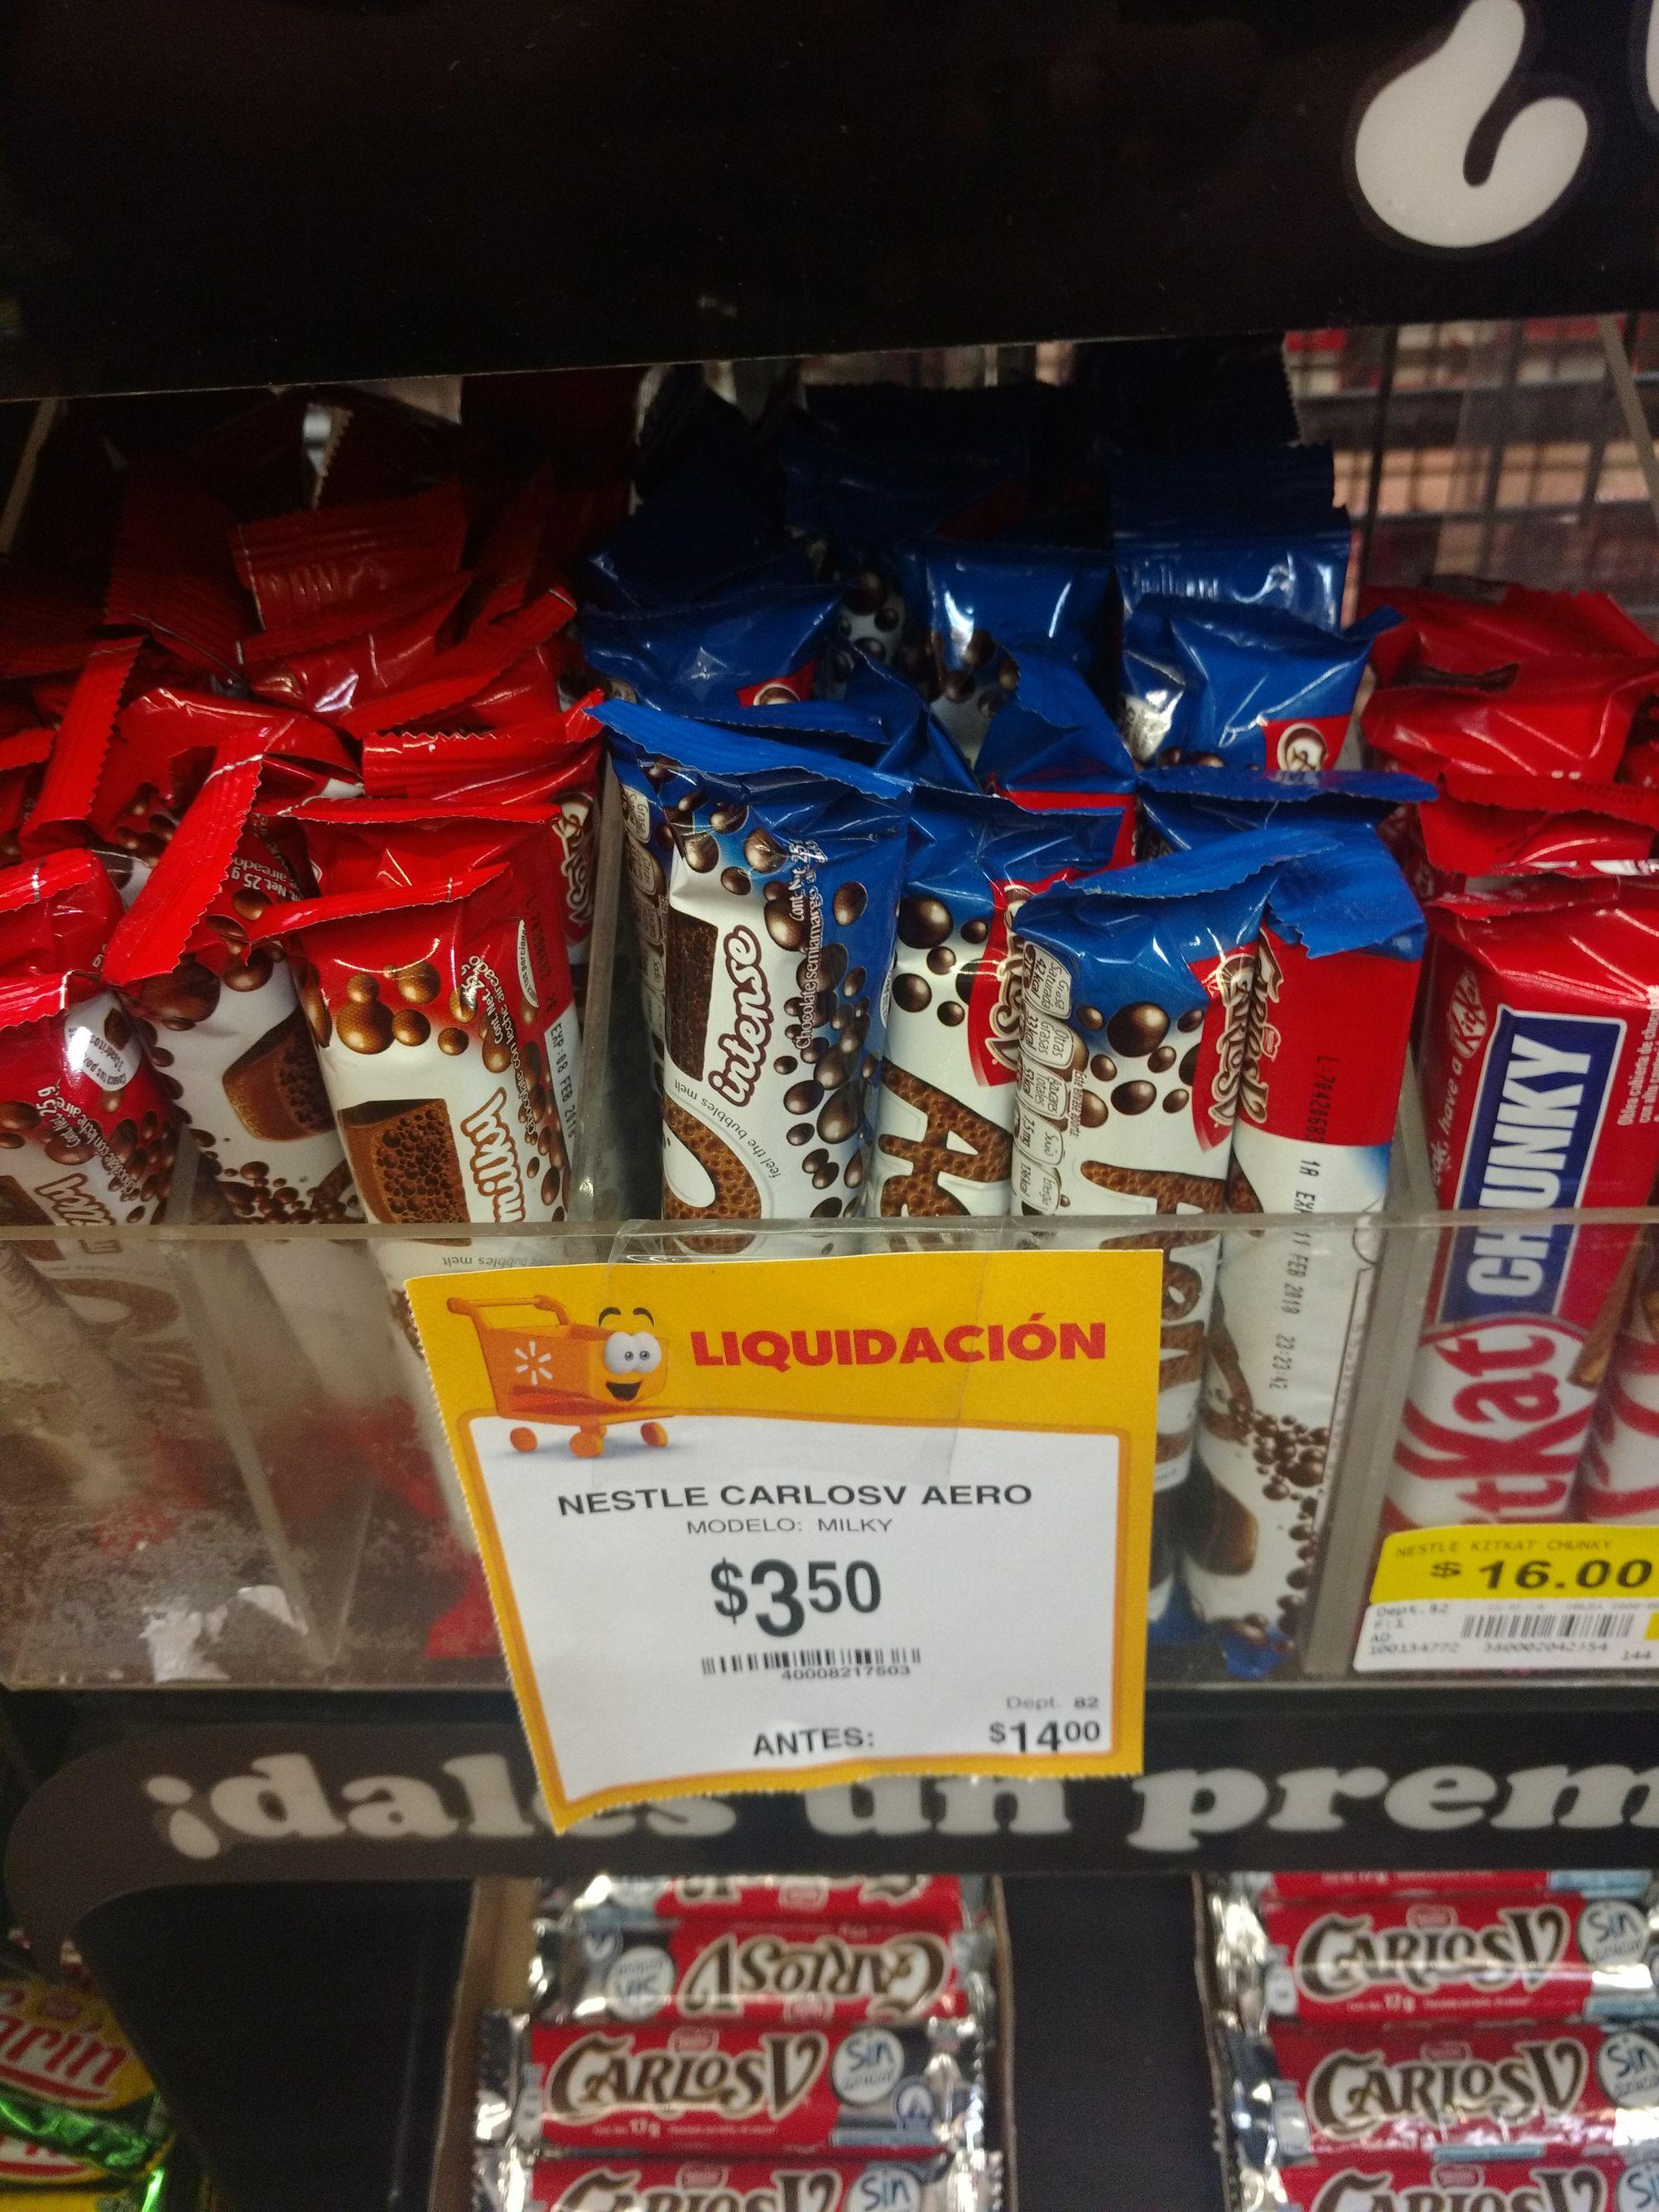 Walmart tuxtla ote: Chocolates Aero Carlos V $3.50